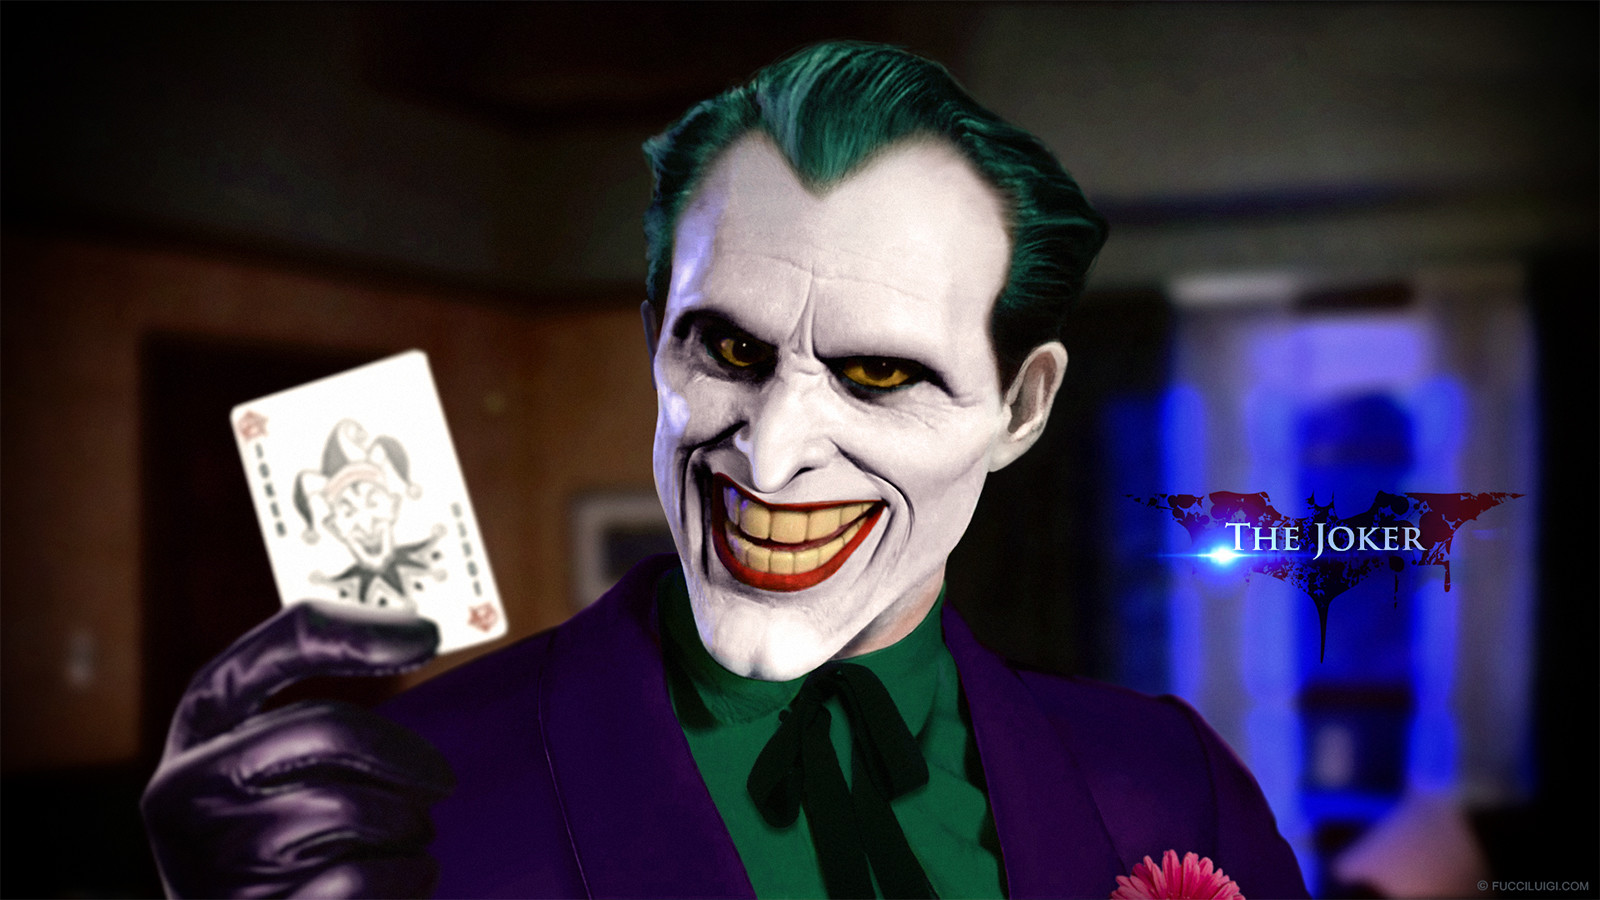 Artstation - Joker Concept Art Fucci Luigi